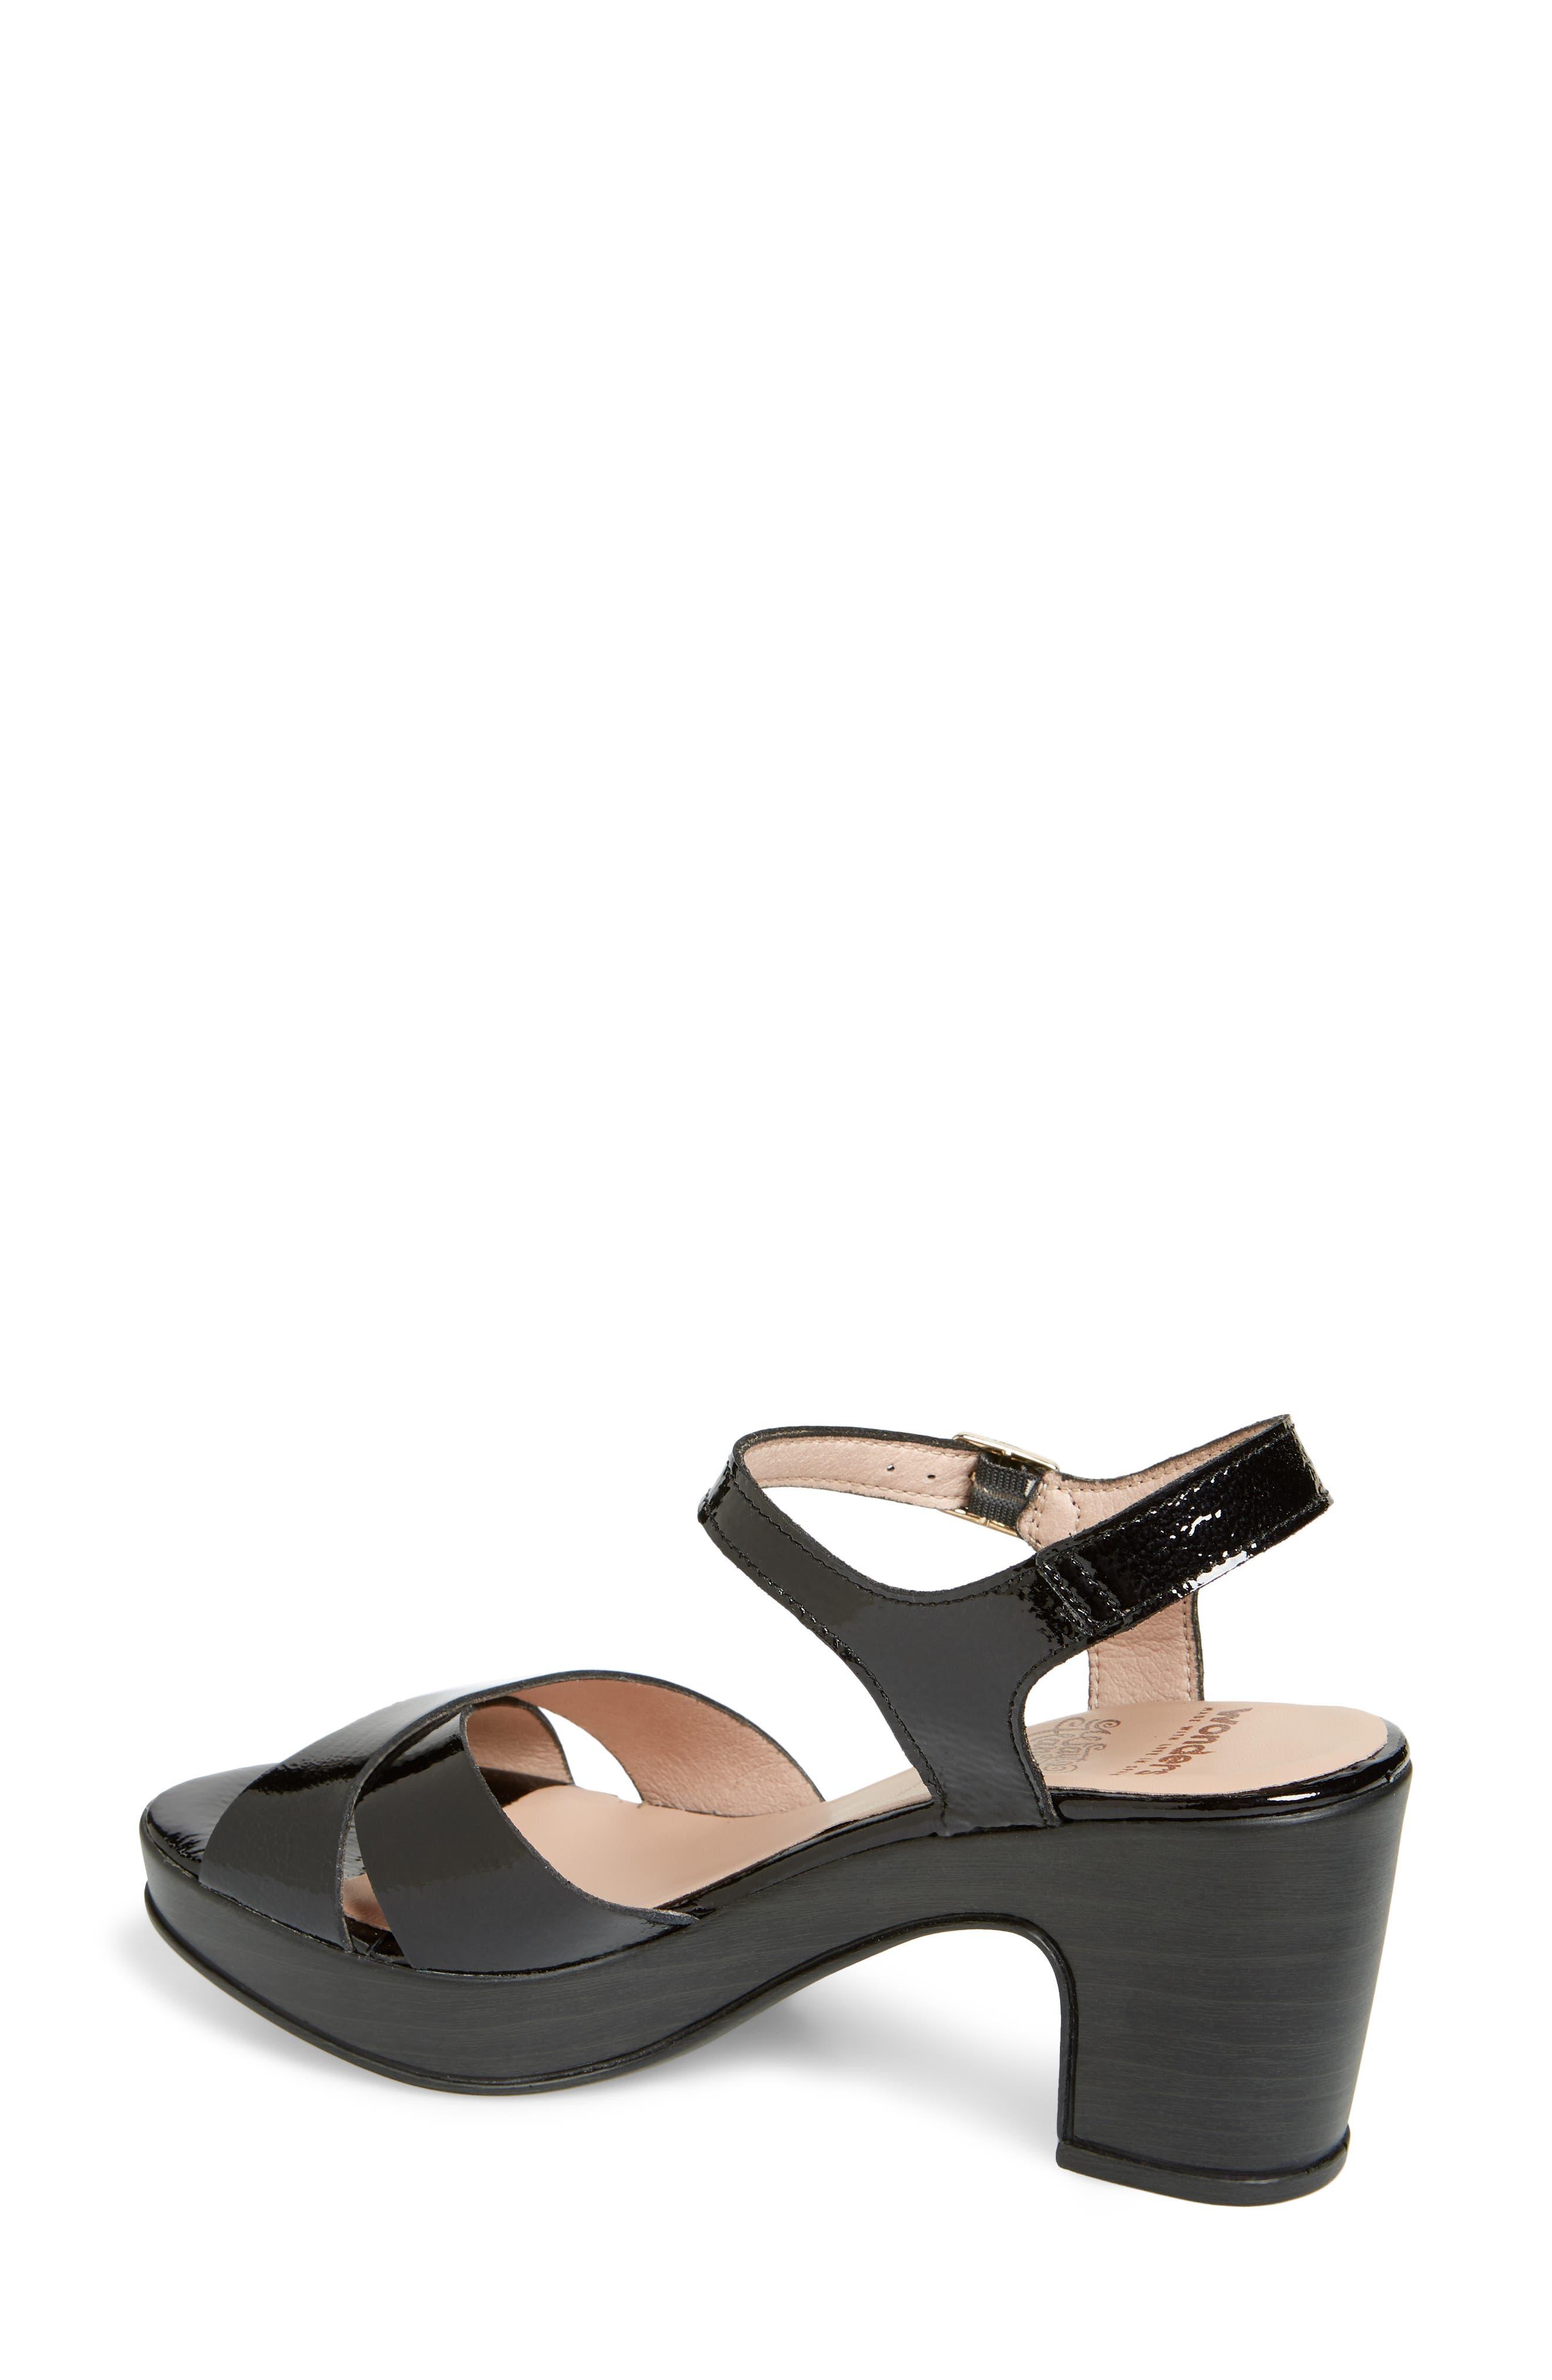 Platform Sandal,                             Alternate thumbnail 2, color,                             BLACK PATENT LEATHER